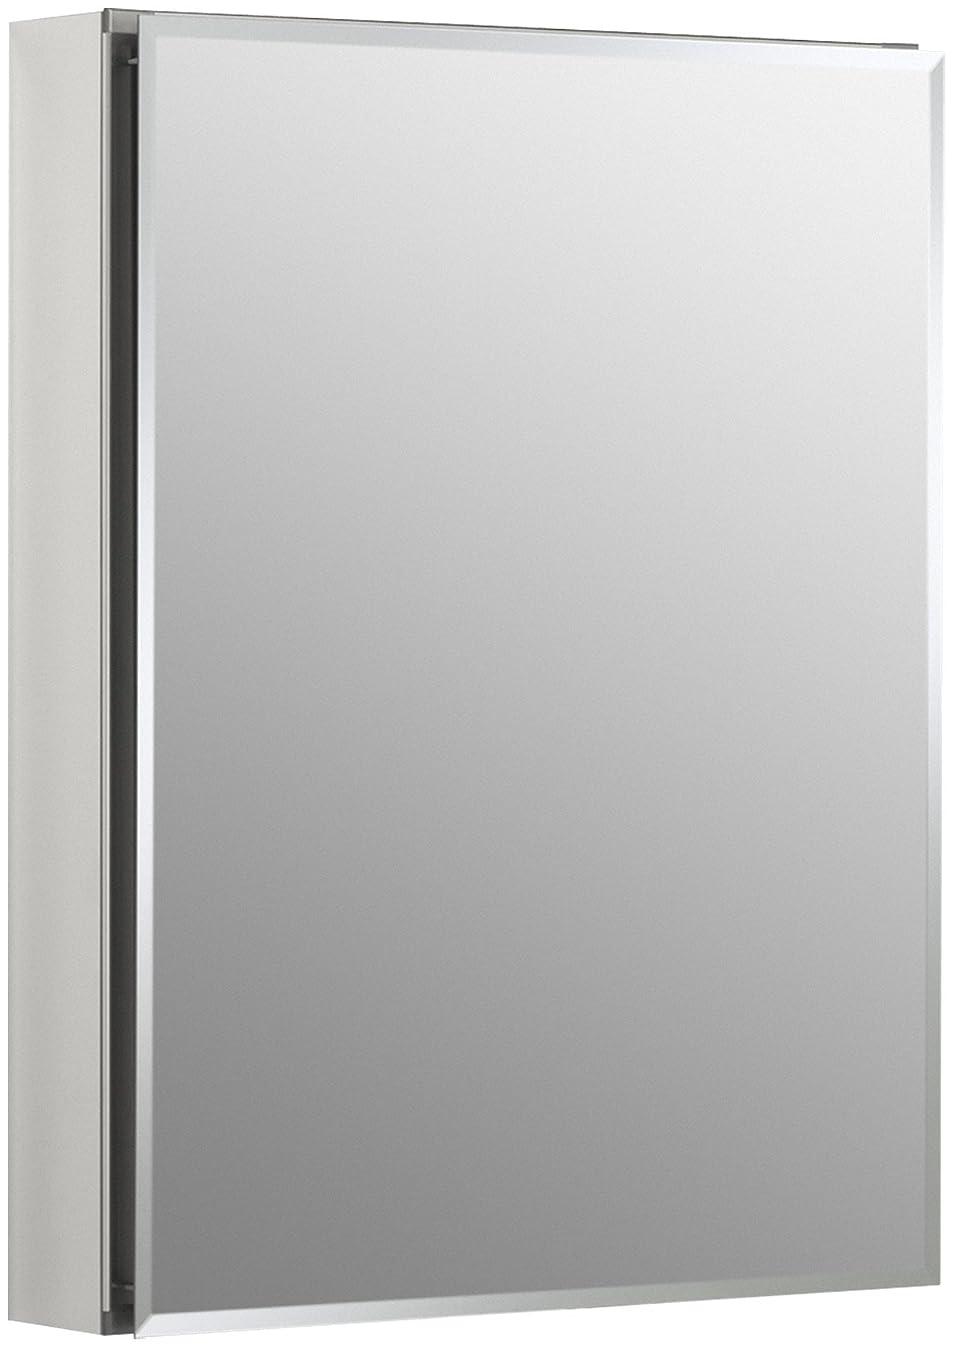 KOHLER K-CB-CLC2026FS Frameless 20 inch x 26 inch Aluminum Bathroom Medicine Cabinet; ; Recess or Surface Mount